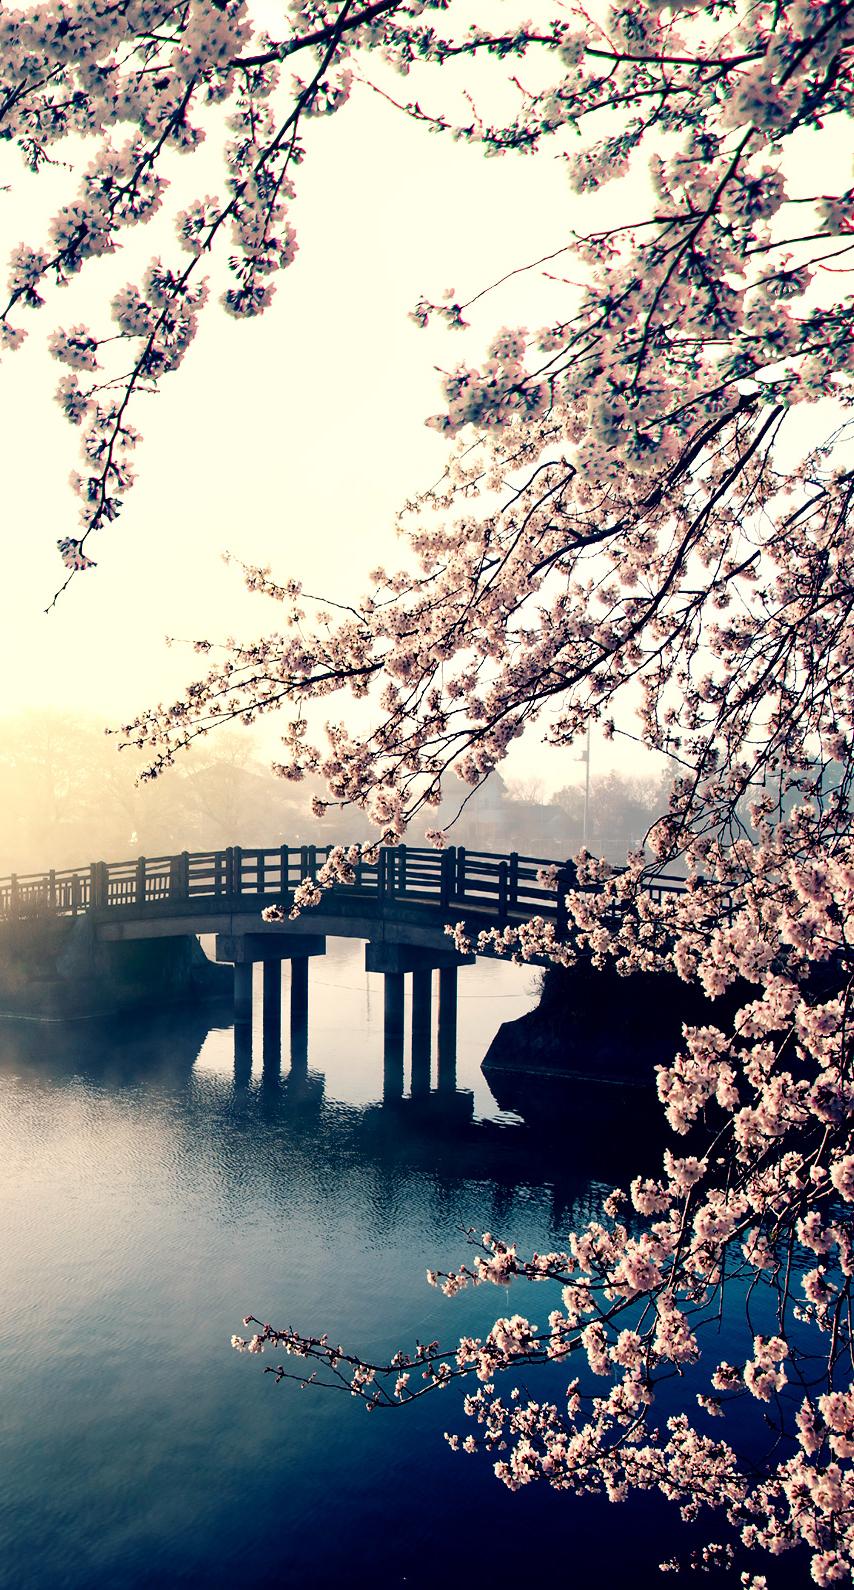 outdoors, architecture, season, cold, mist, composure